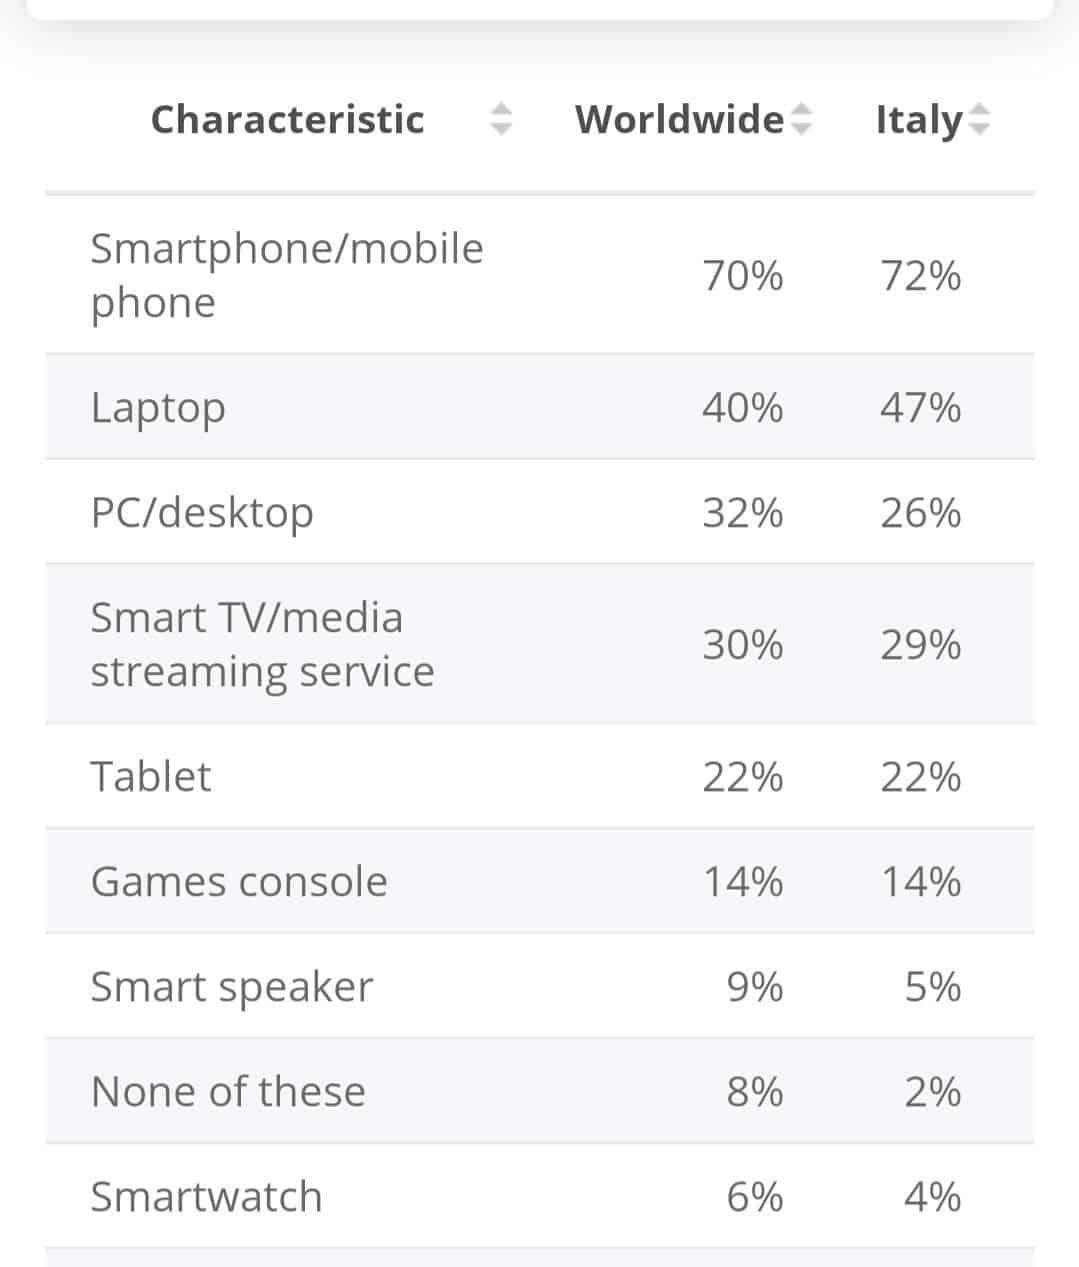 mobile user data worldwide in lockdown pandemic